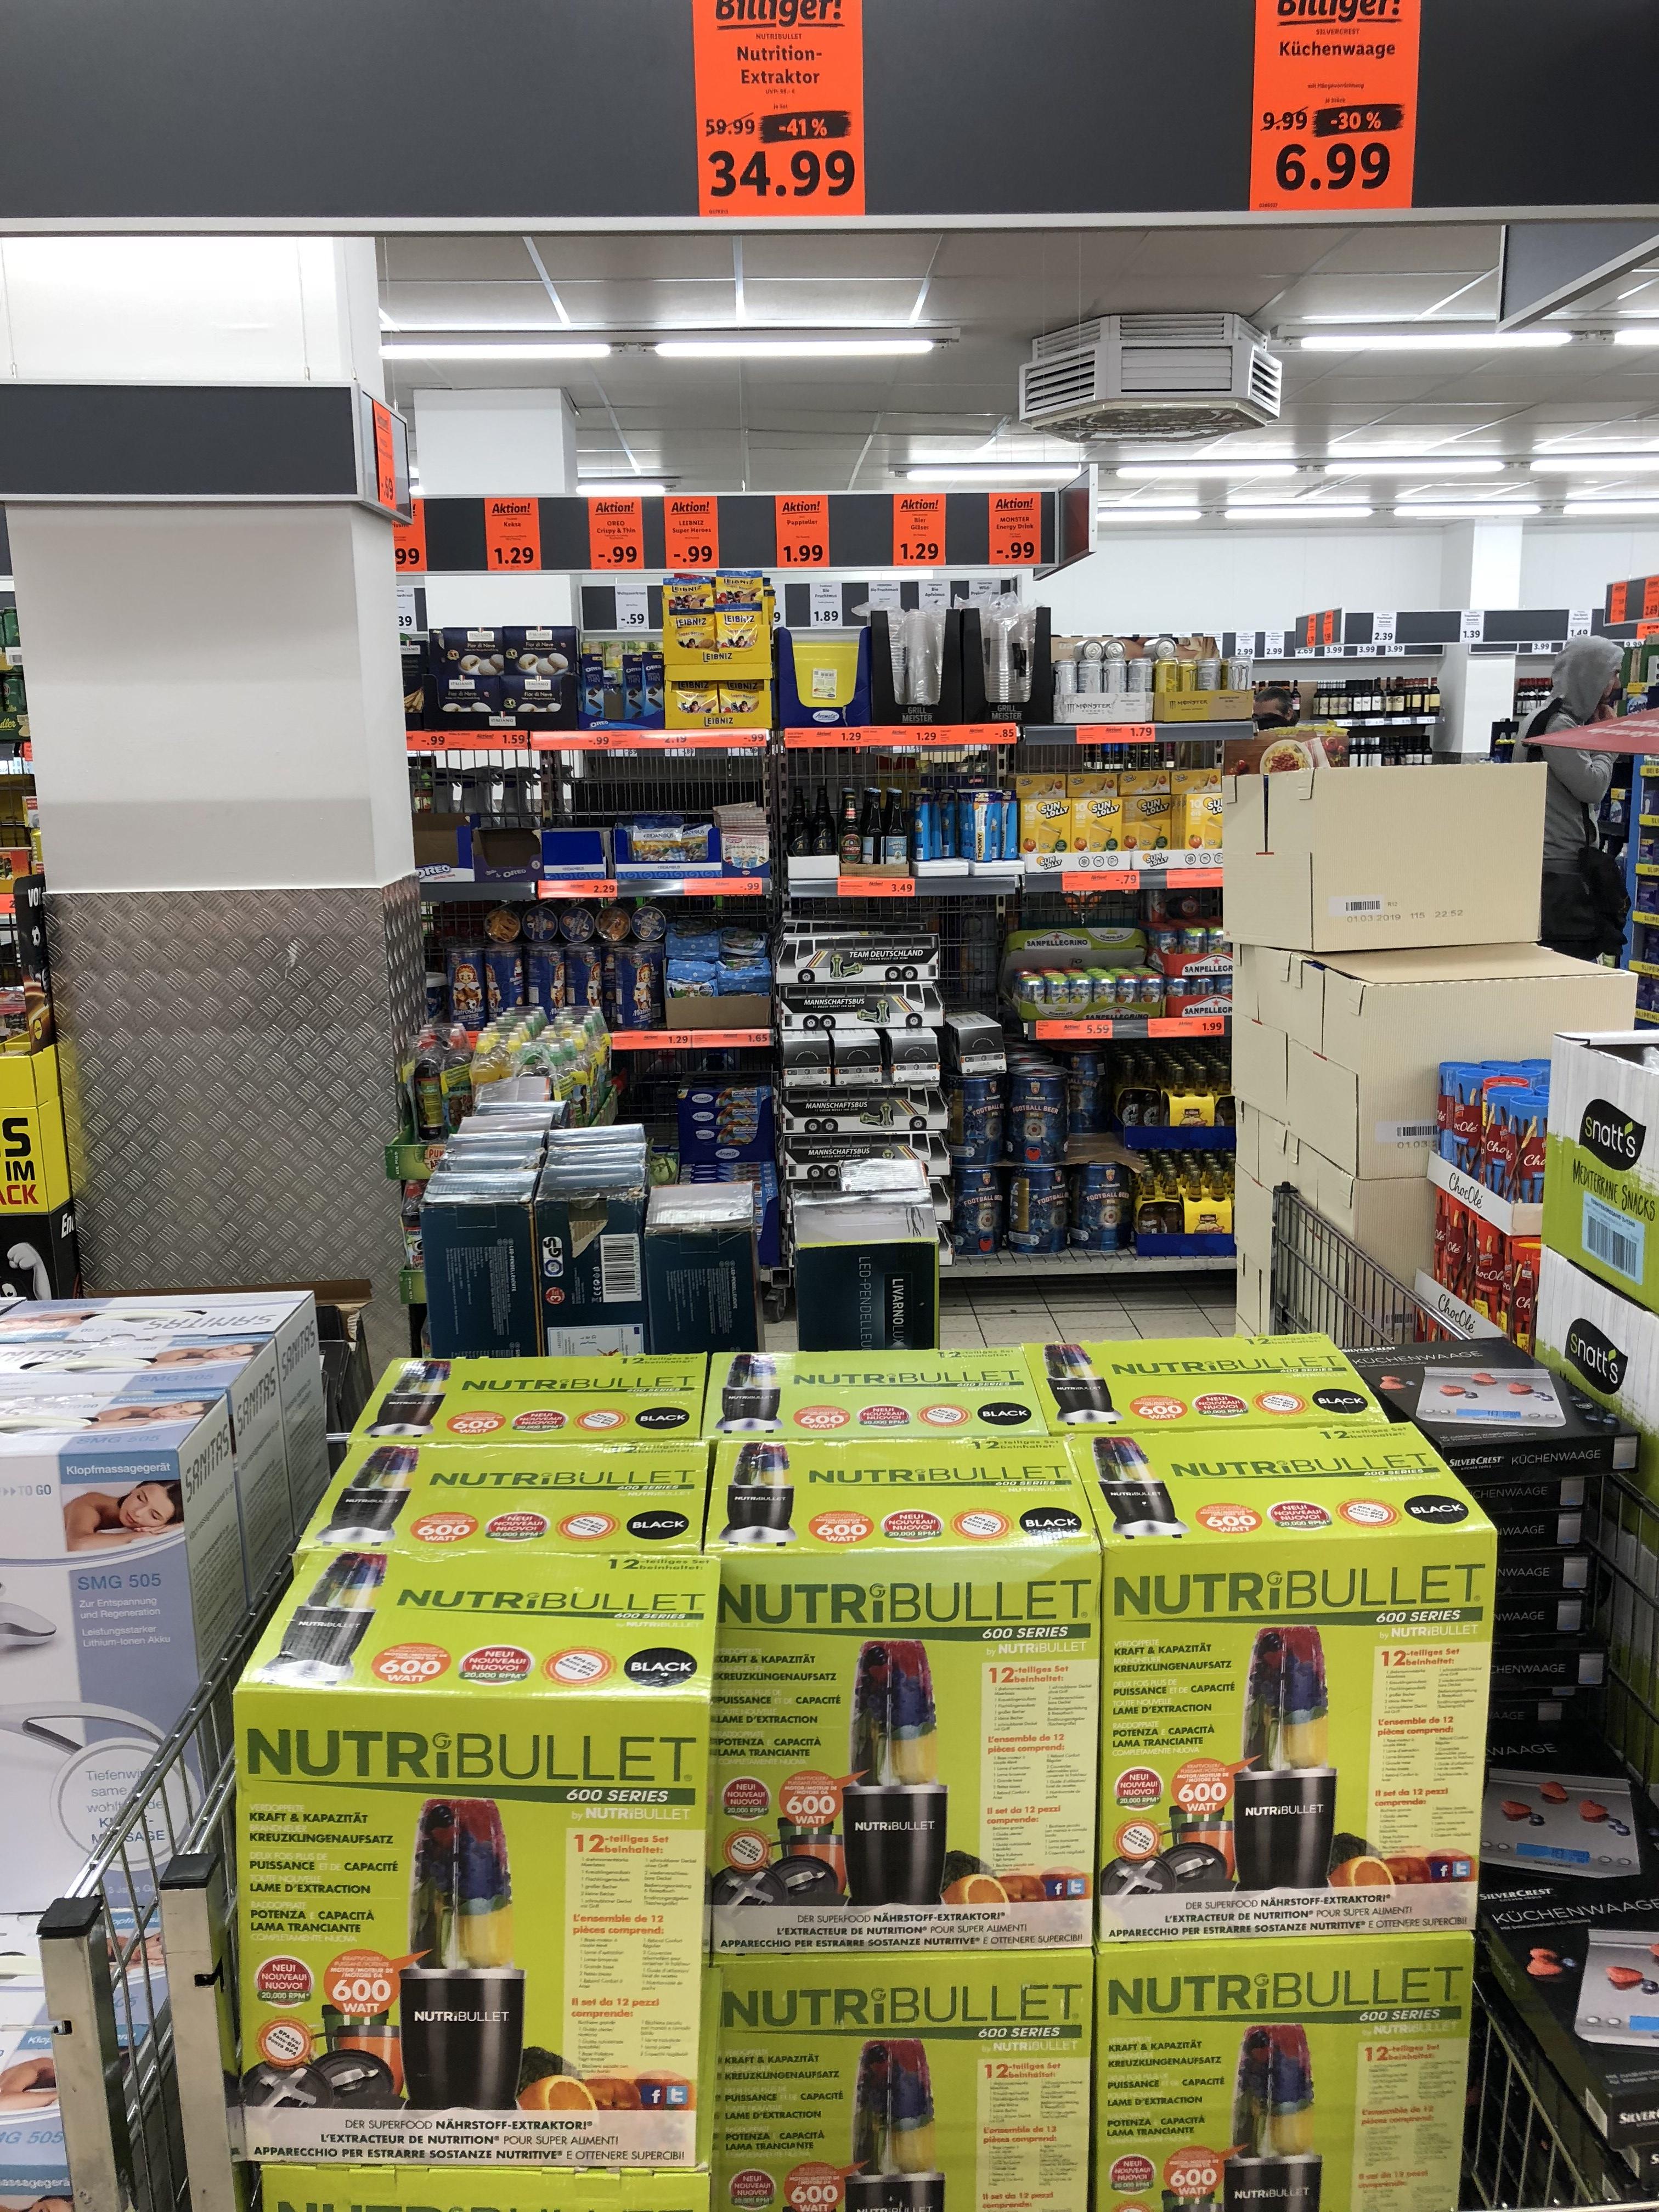 NutriBullet Nutrition-Extraktor lokal bei Lidl in Dortmund